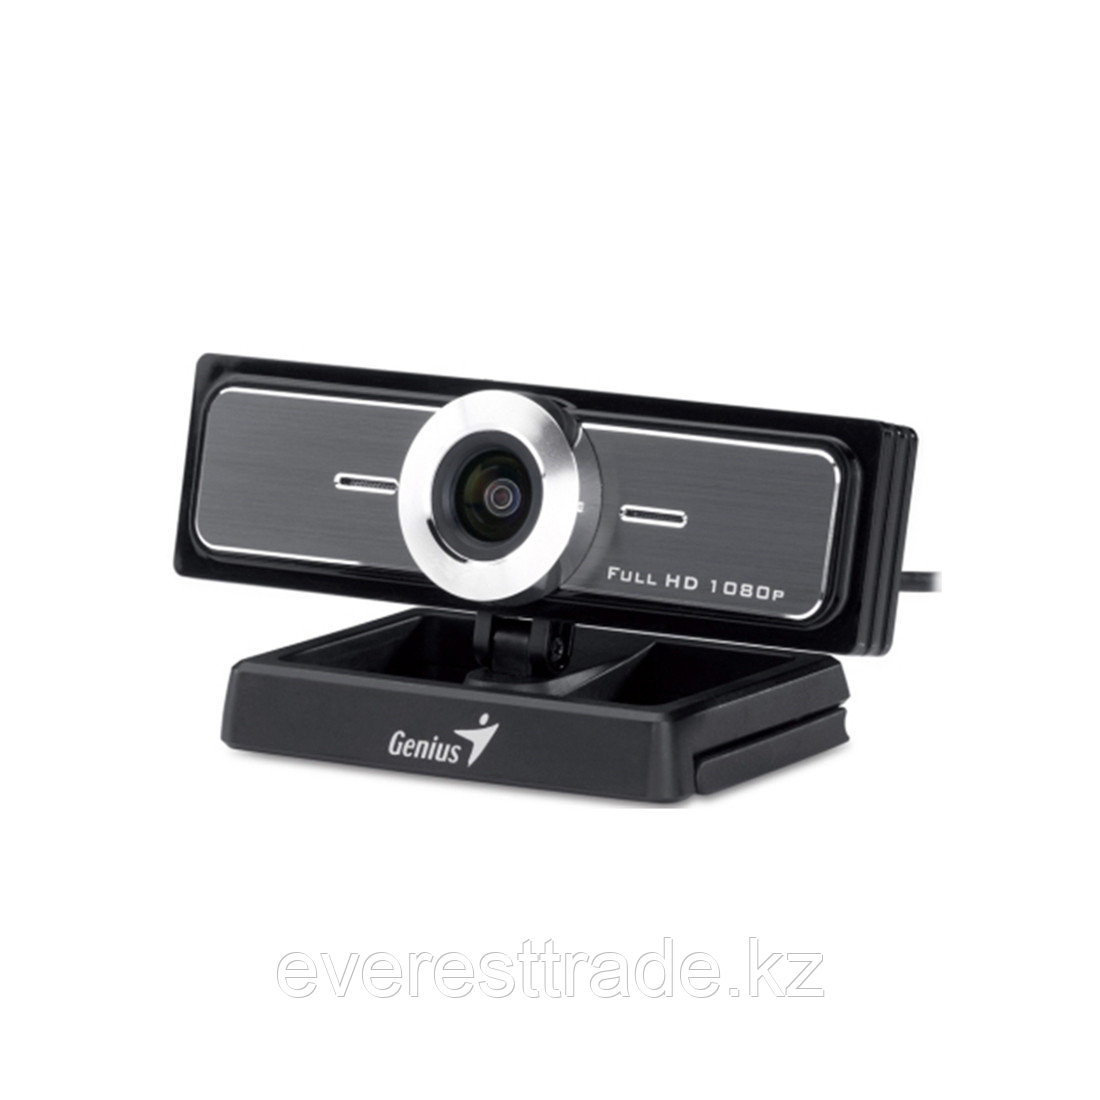 Genius Веб камера Genius WideCam F100, USB 2.0, 2.0Mpx